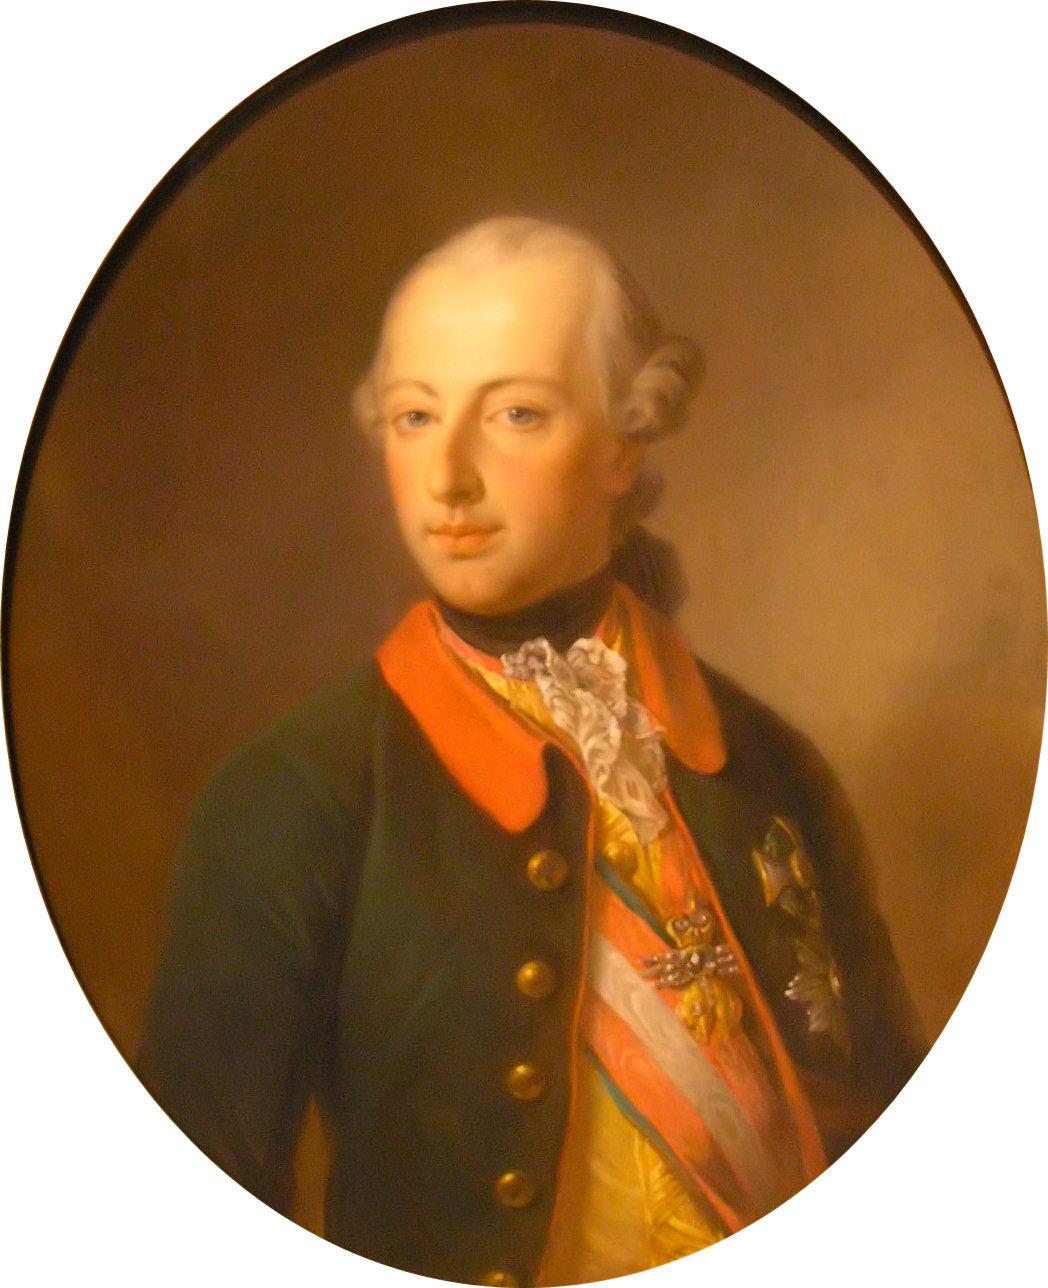 Joseph II (1780-1790)